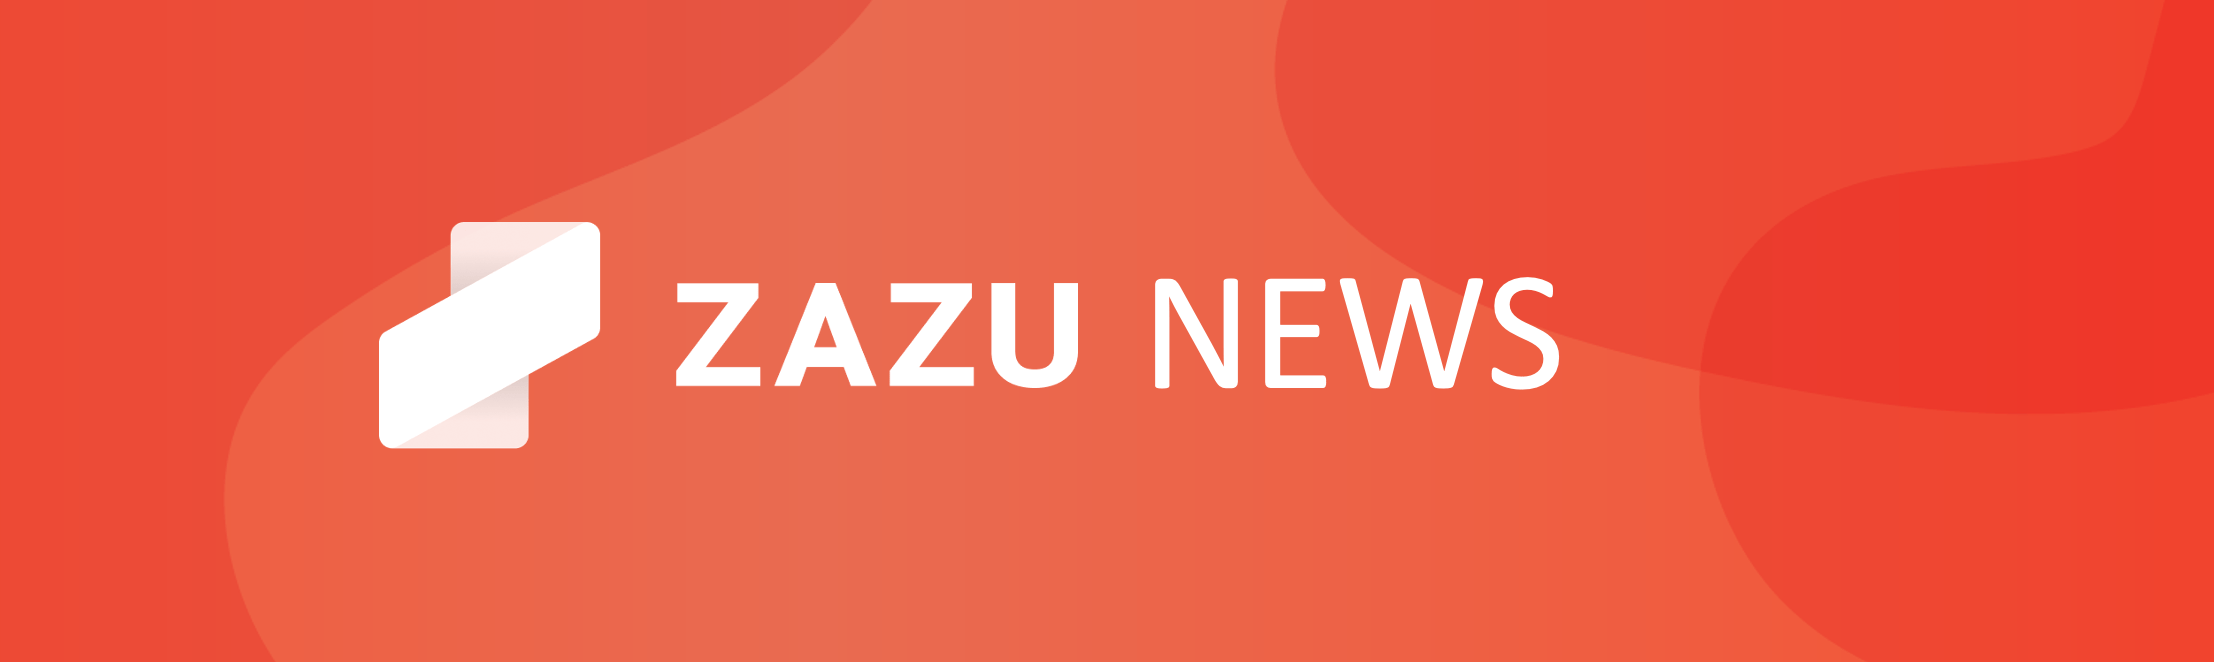 zazu article new funding